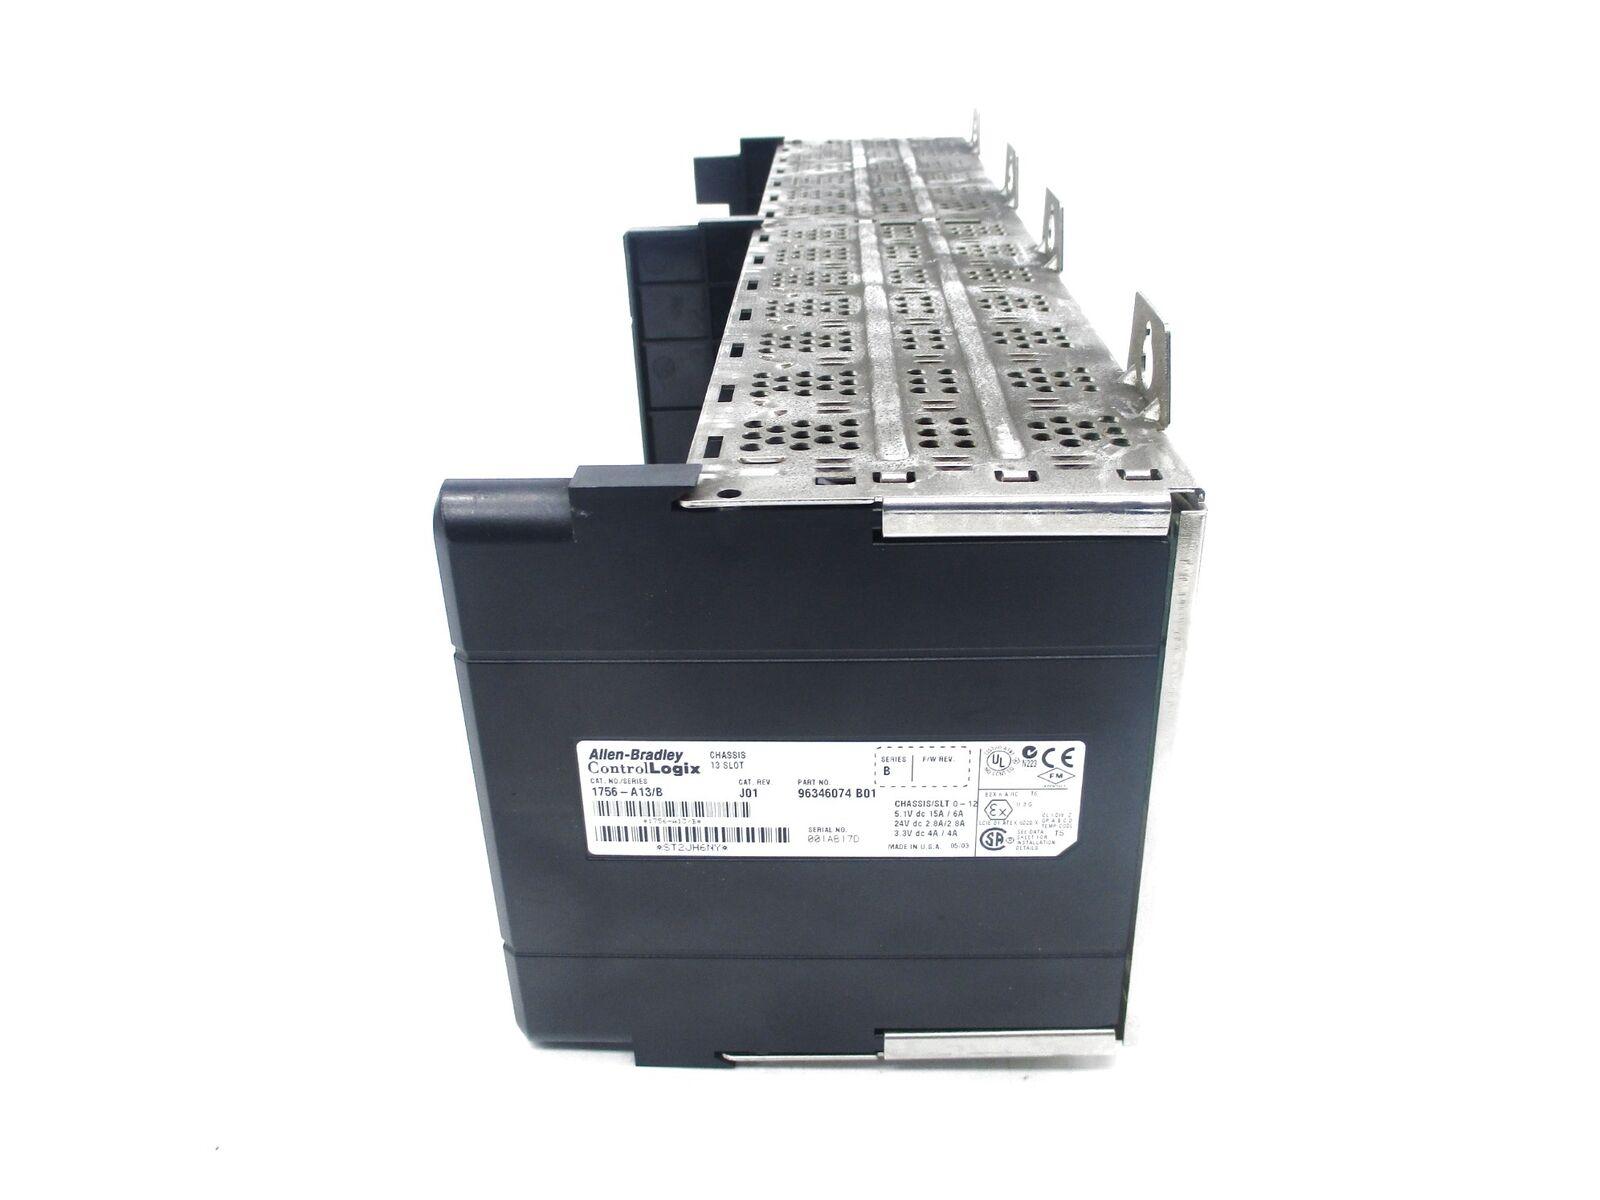 1756-A1313槽PLC机架ControlLogix 13 Slots Chassis